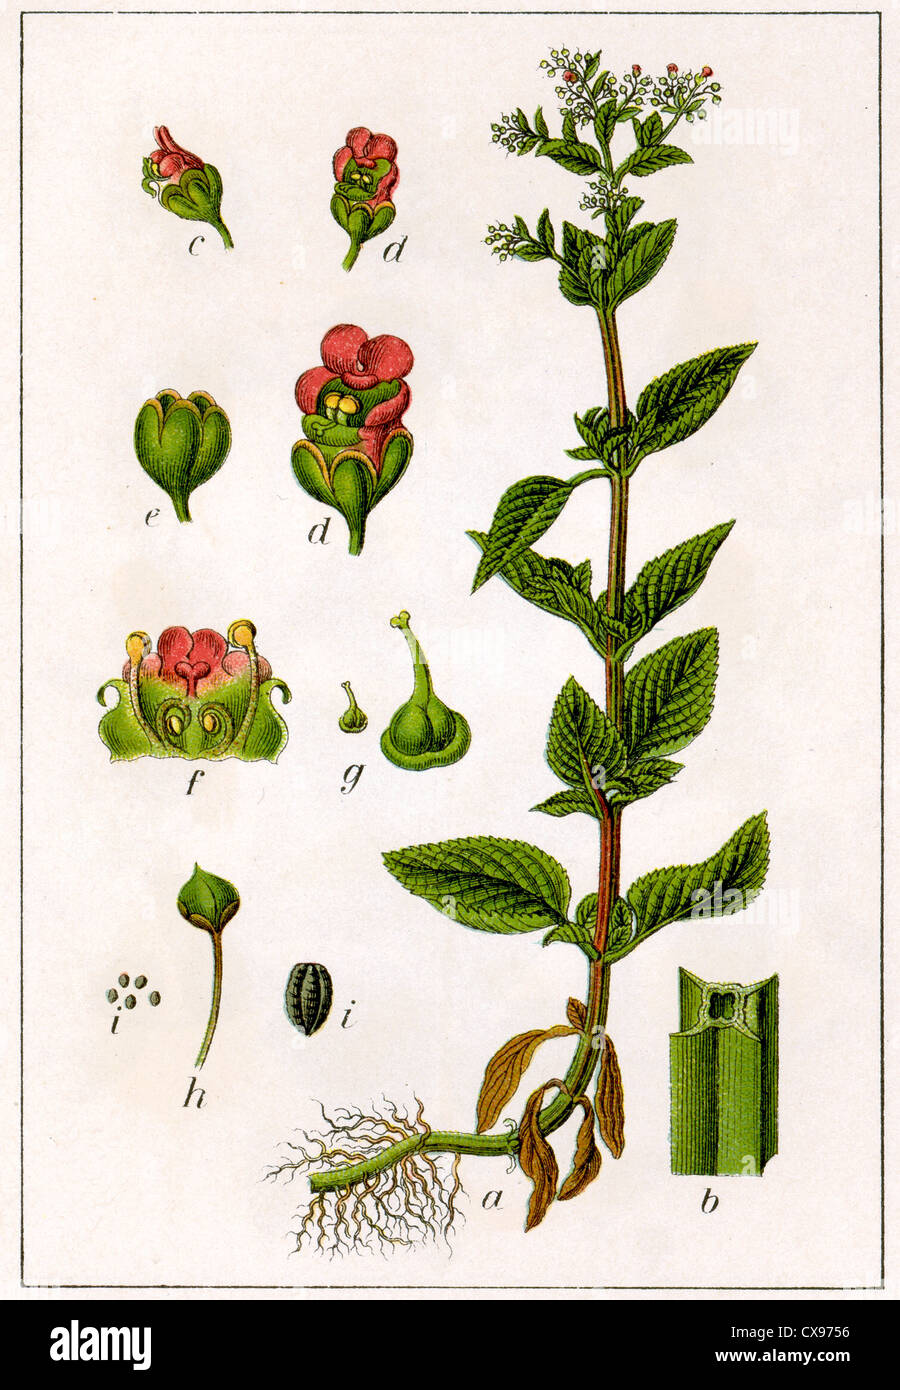 Scrofularia Ehrharti - Stock Image